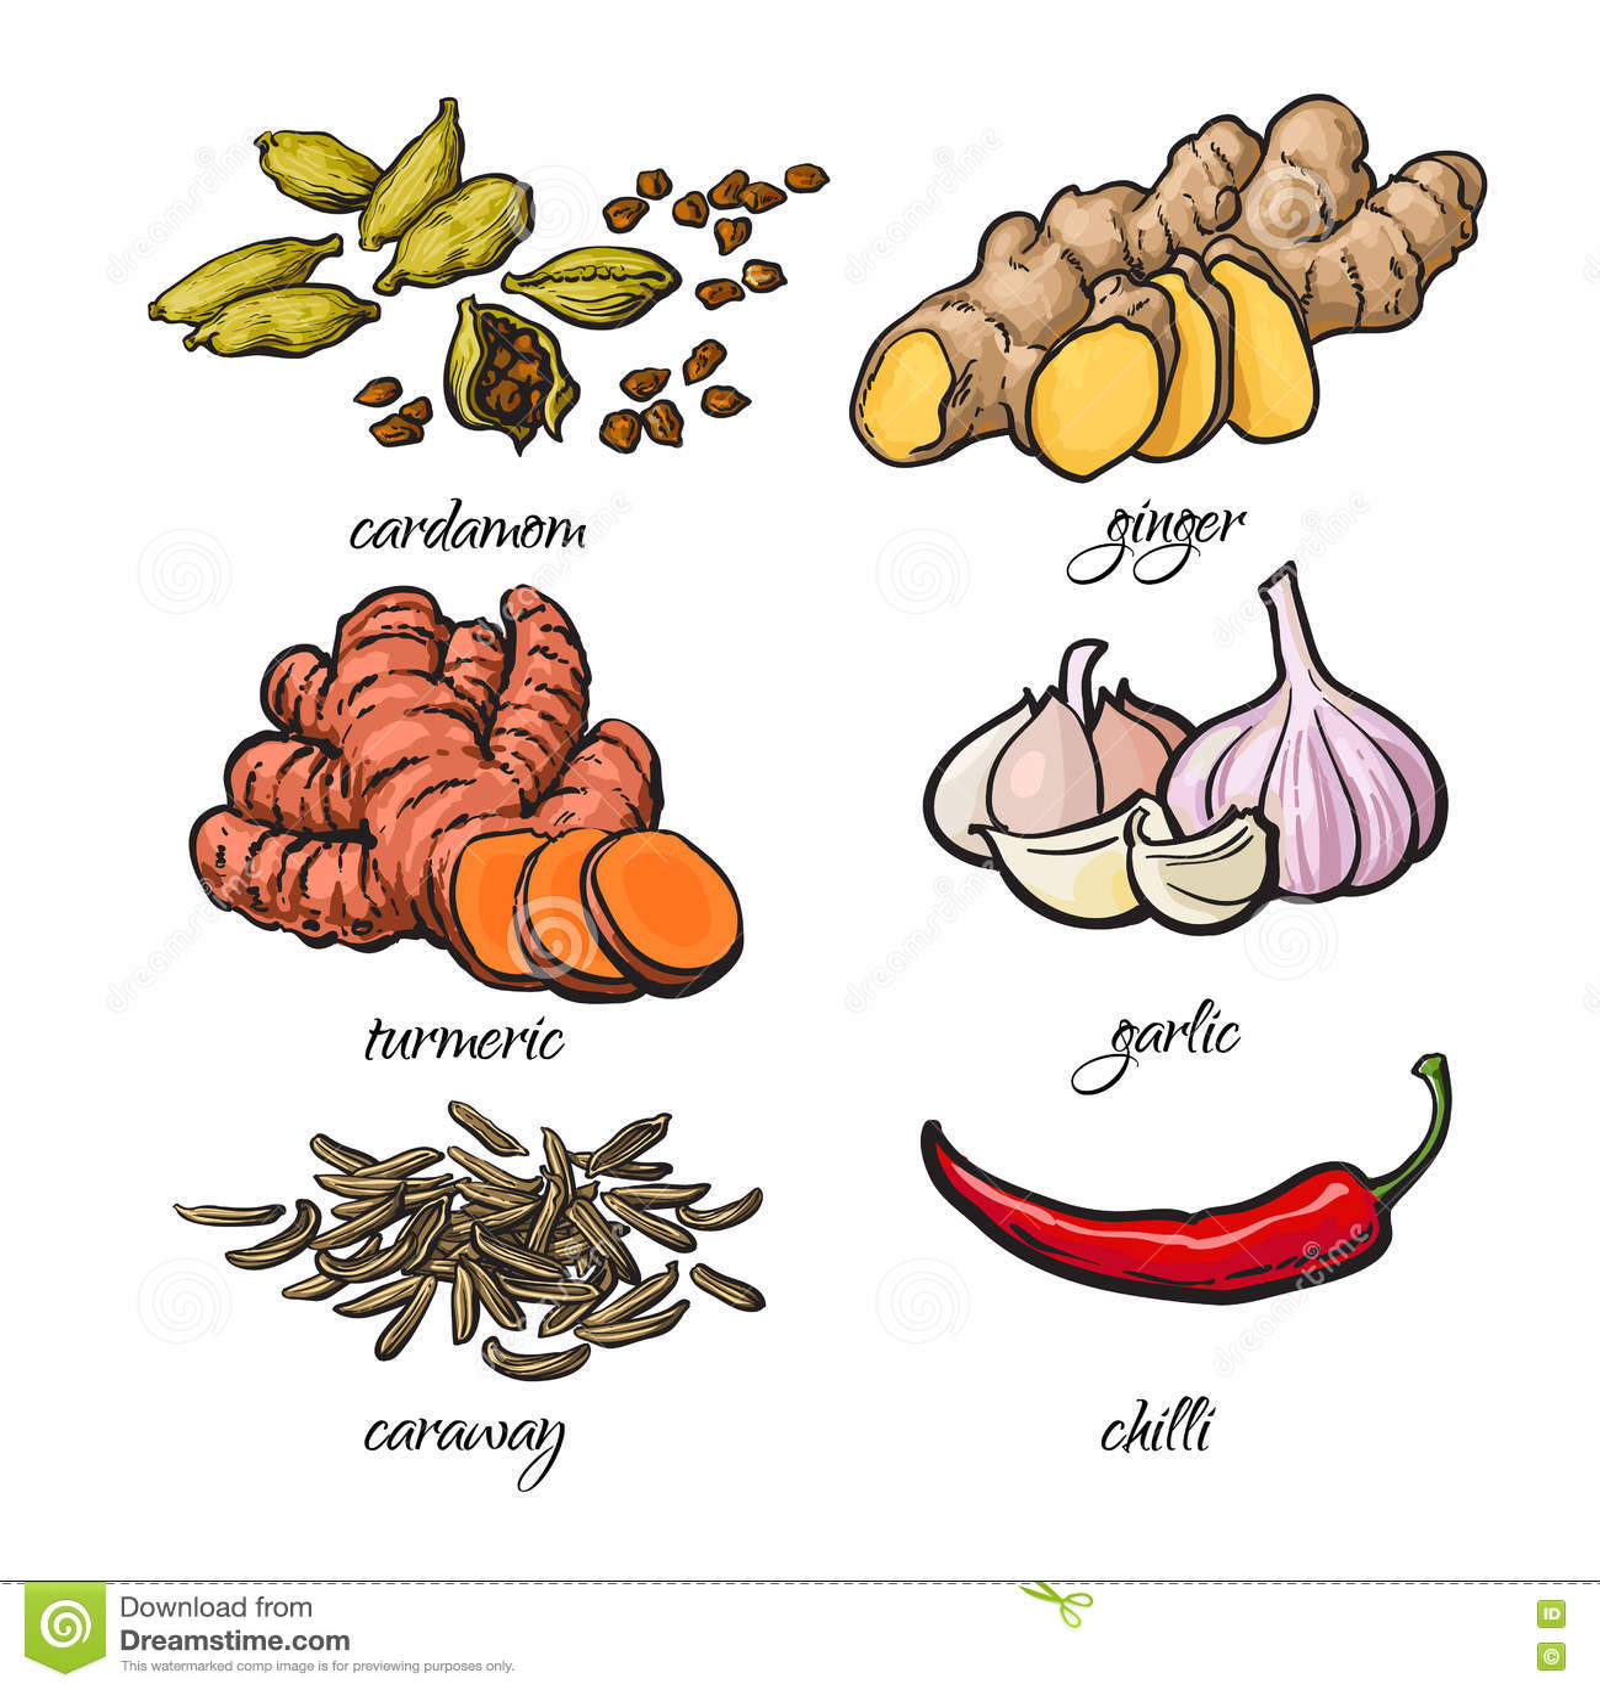 Kreśli stylowe pikantność - czosnek, imbir, turmeric, kardamon, chili, karolek